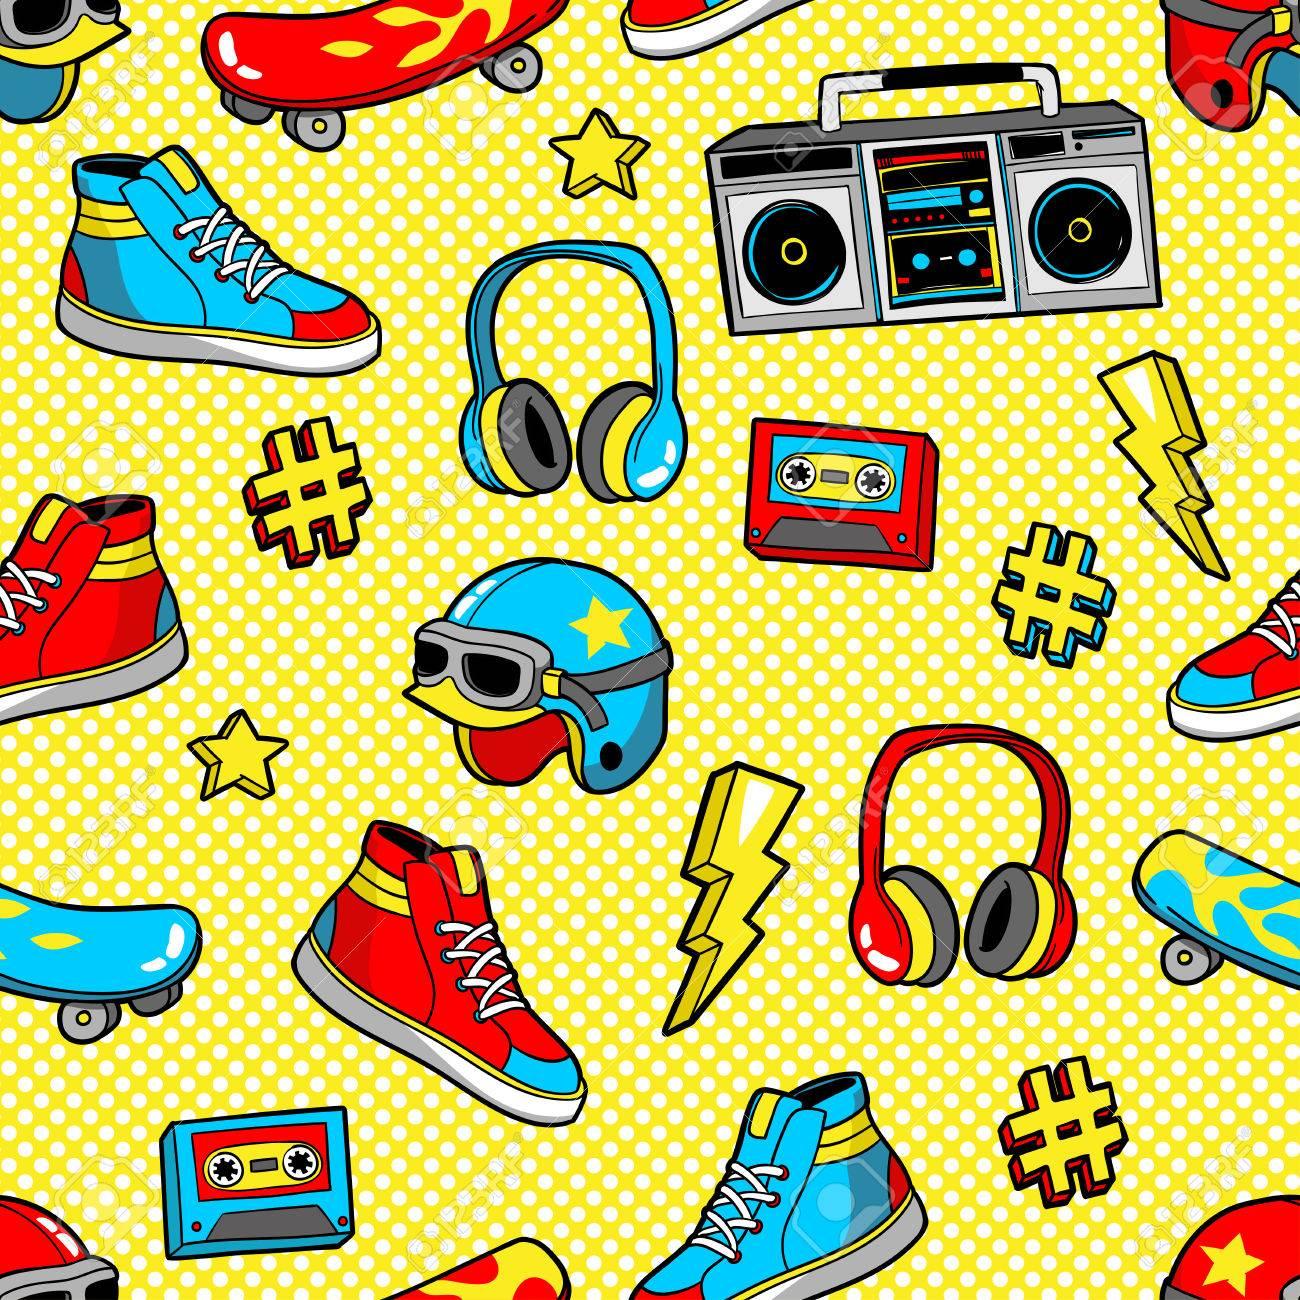 Seamless pattern in cartoon 80s-90s comic style. - 81388261